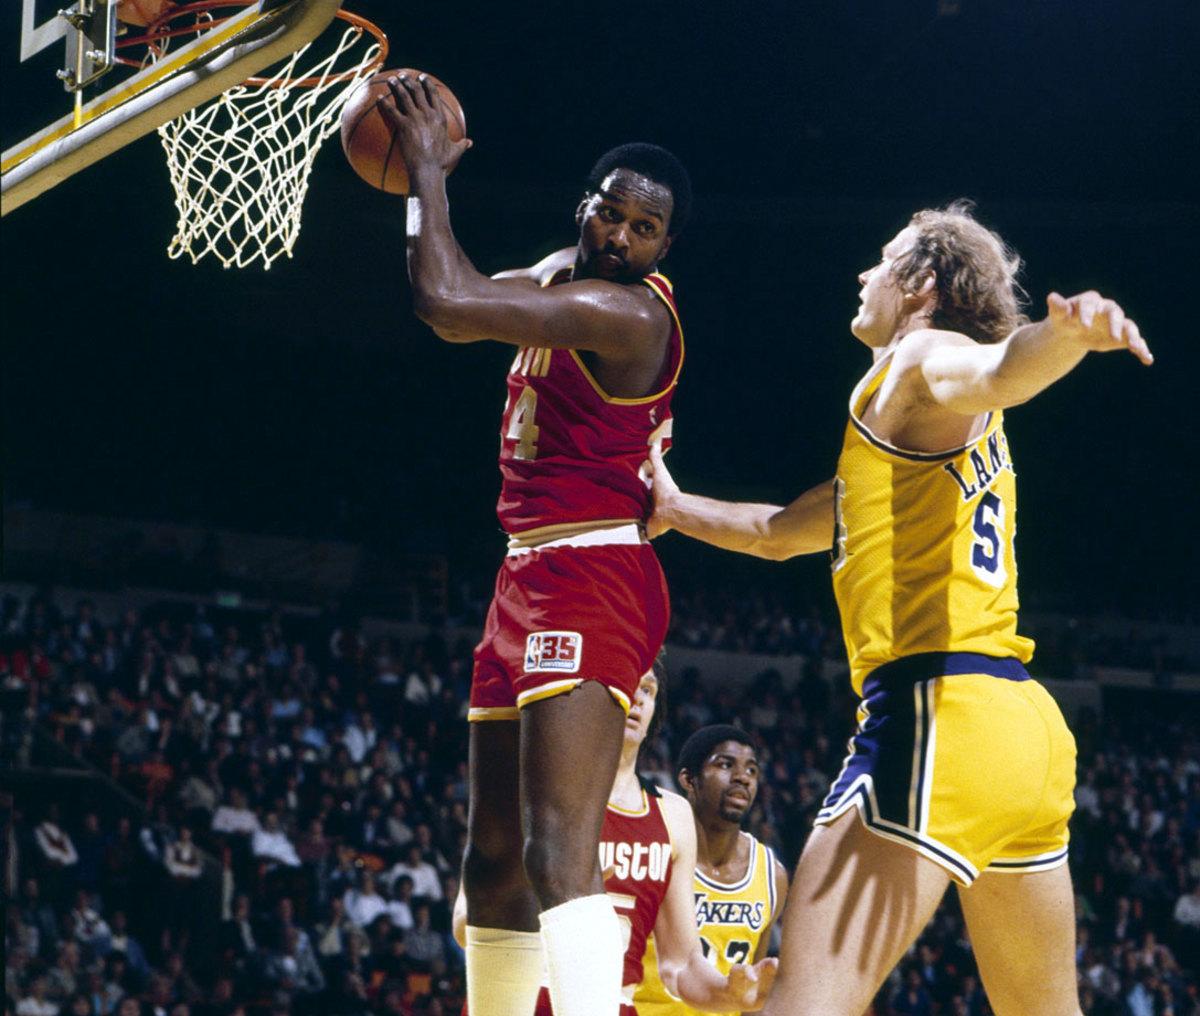 1981-Moses-Malone-Mark-Landsberger-080100596.jpg